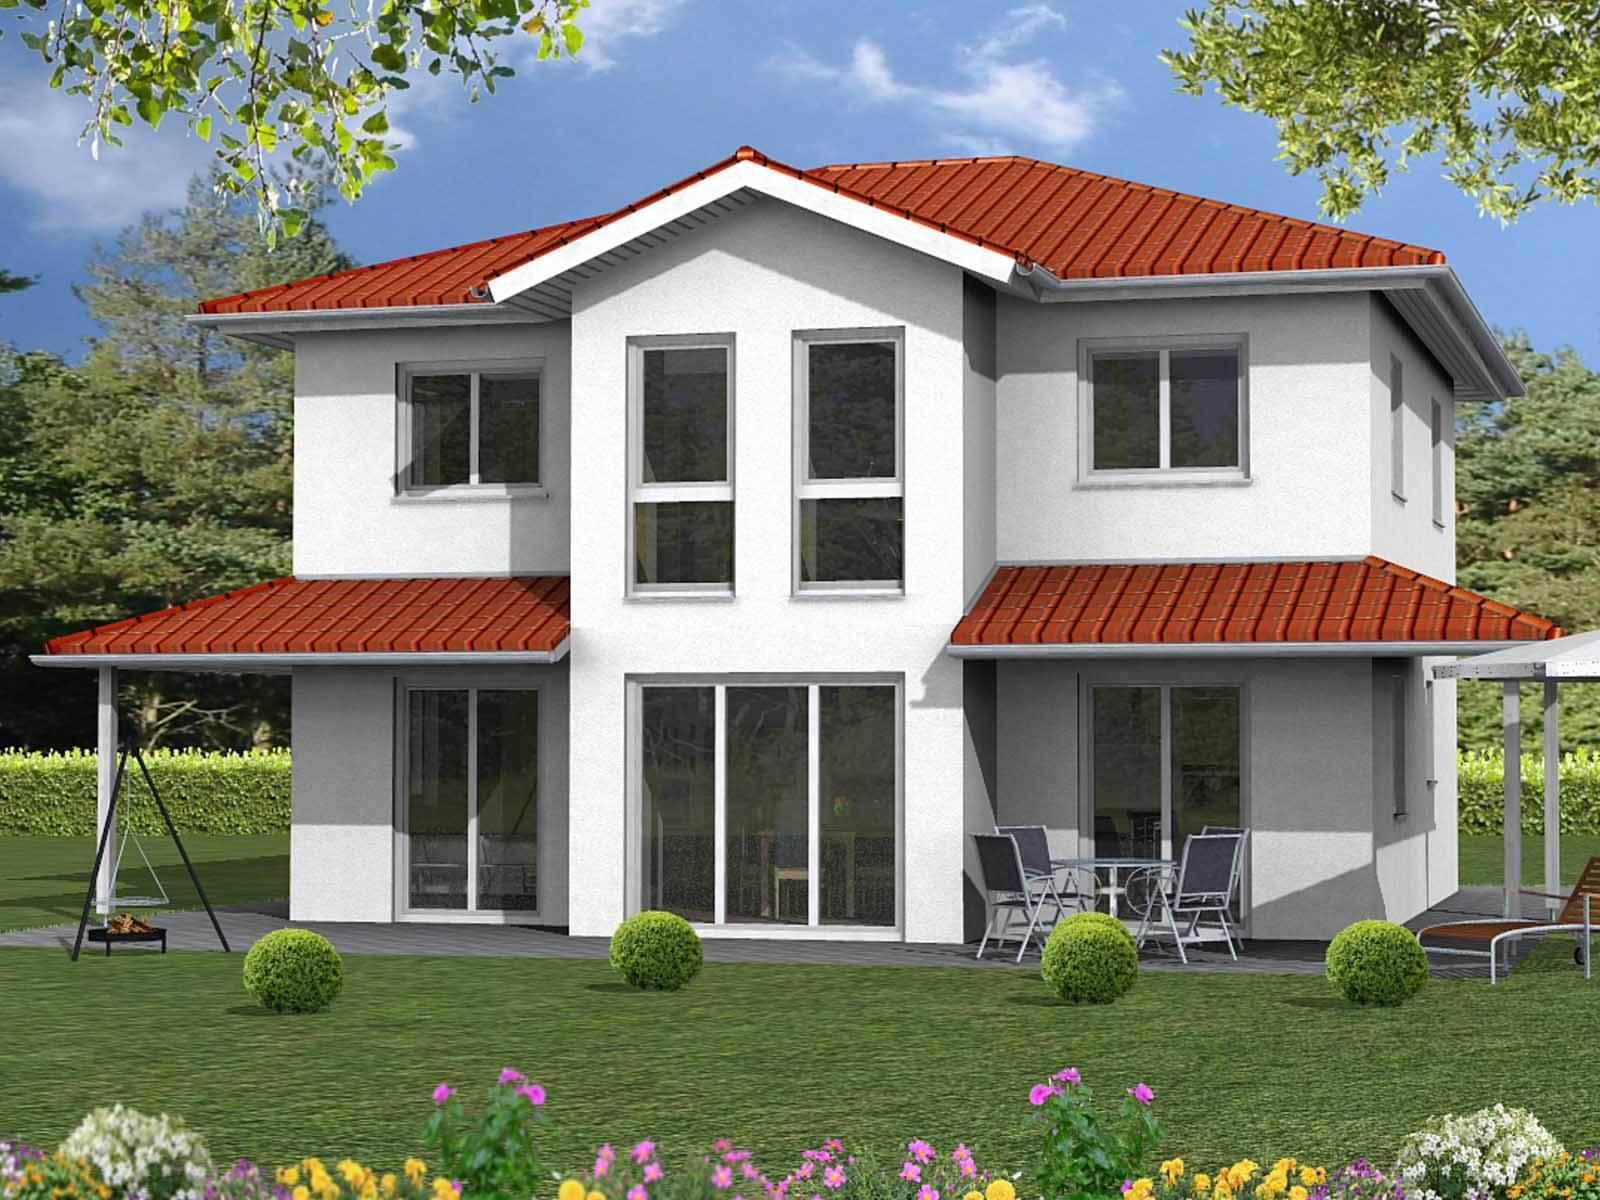 sonnenhaus mediterran dominic lang hauskonzepte. Black Bedroom Furniture Sets. Home Design Ideas